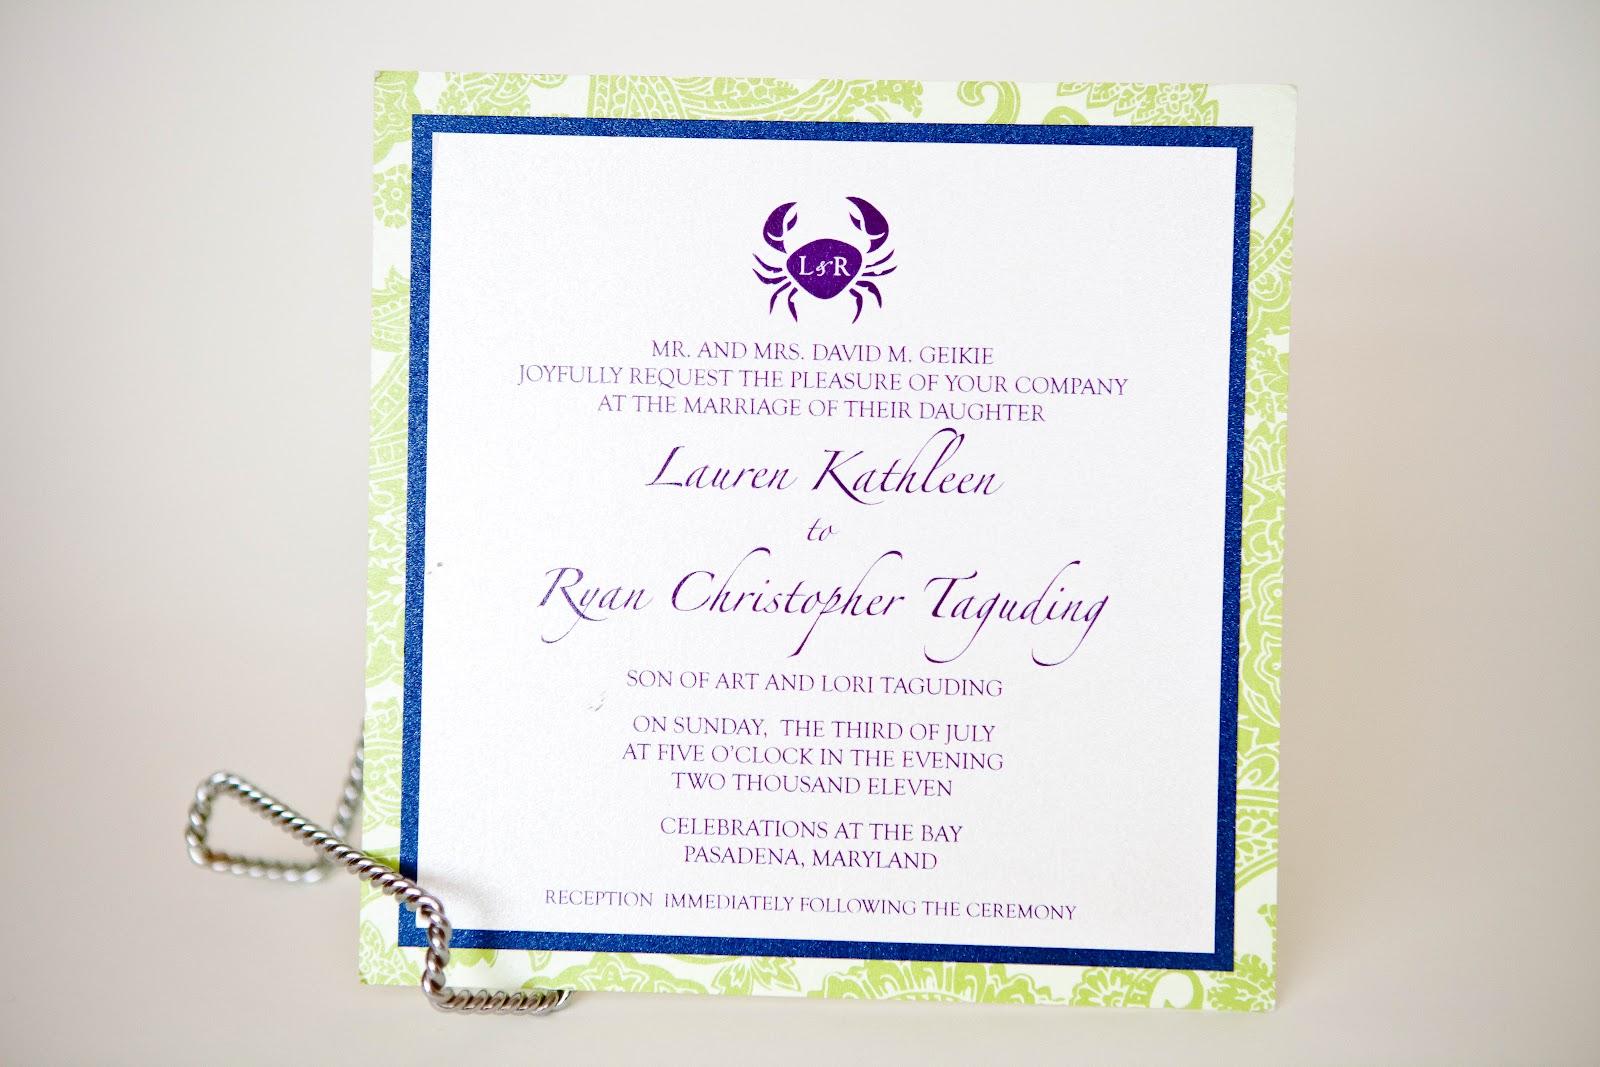 Crab design wedding invitations baltimore kindly rsvp designs blog stopboris Gallery